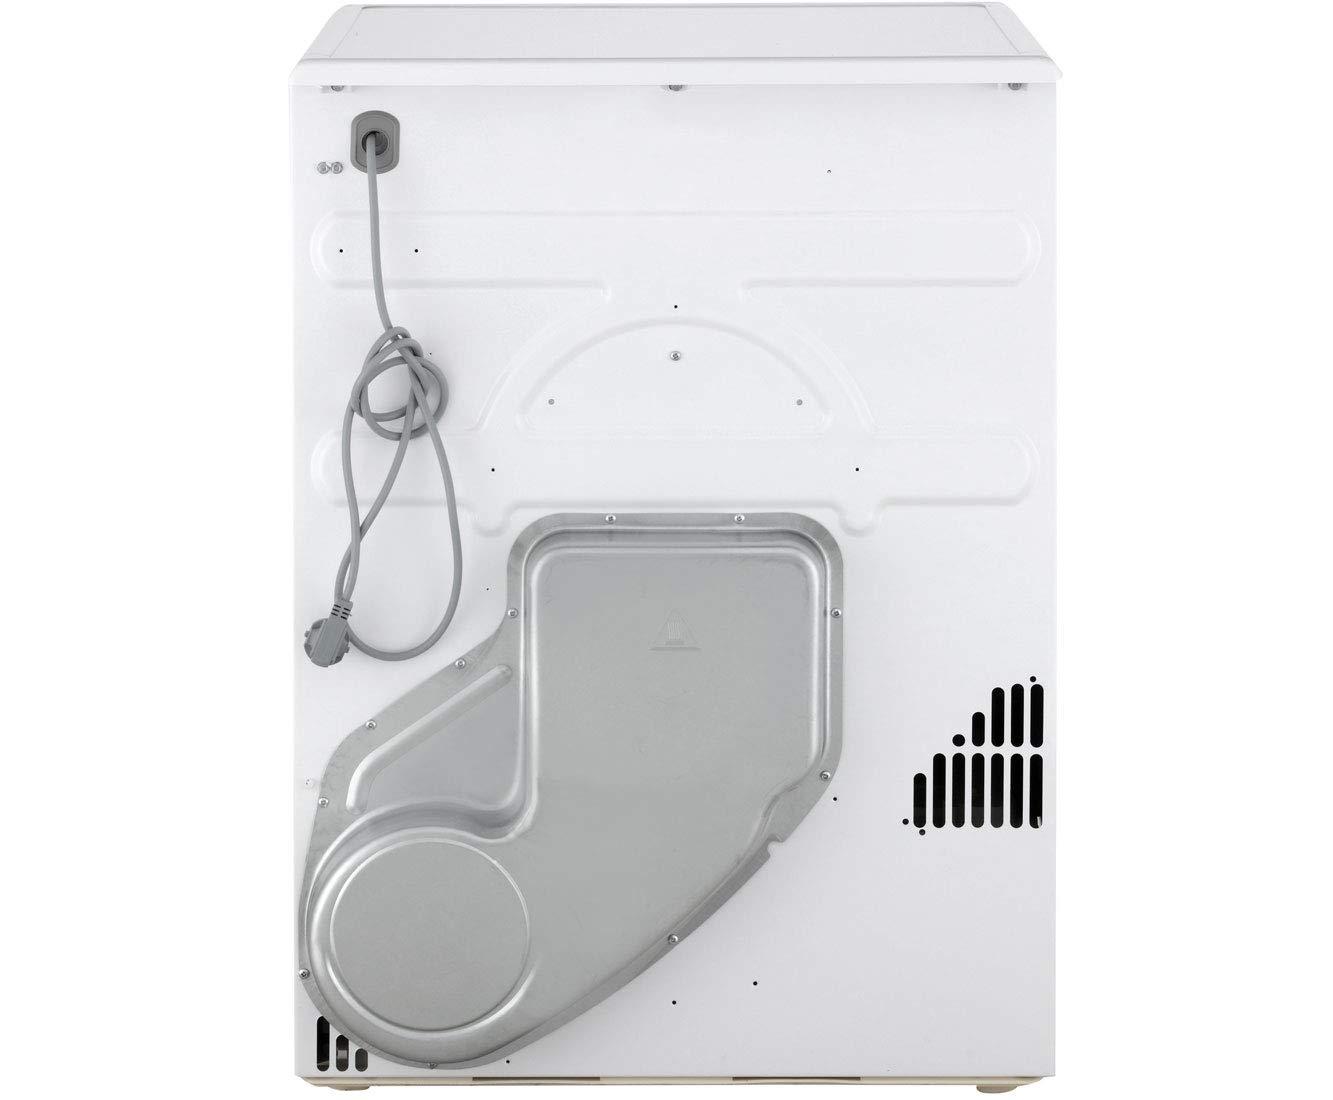 Candy-CS-c8dg-s-autonome-Belastung-Bevor-B-wei–Waschmaschinen-mit-Wsche-Belastung-vor-autonome-wei-links-LED-Galvalume